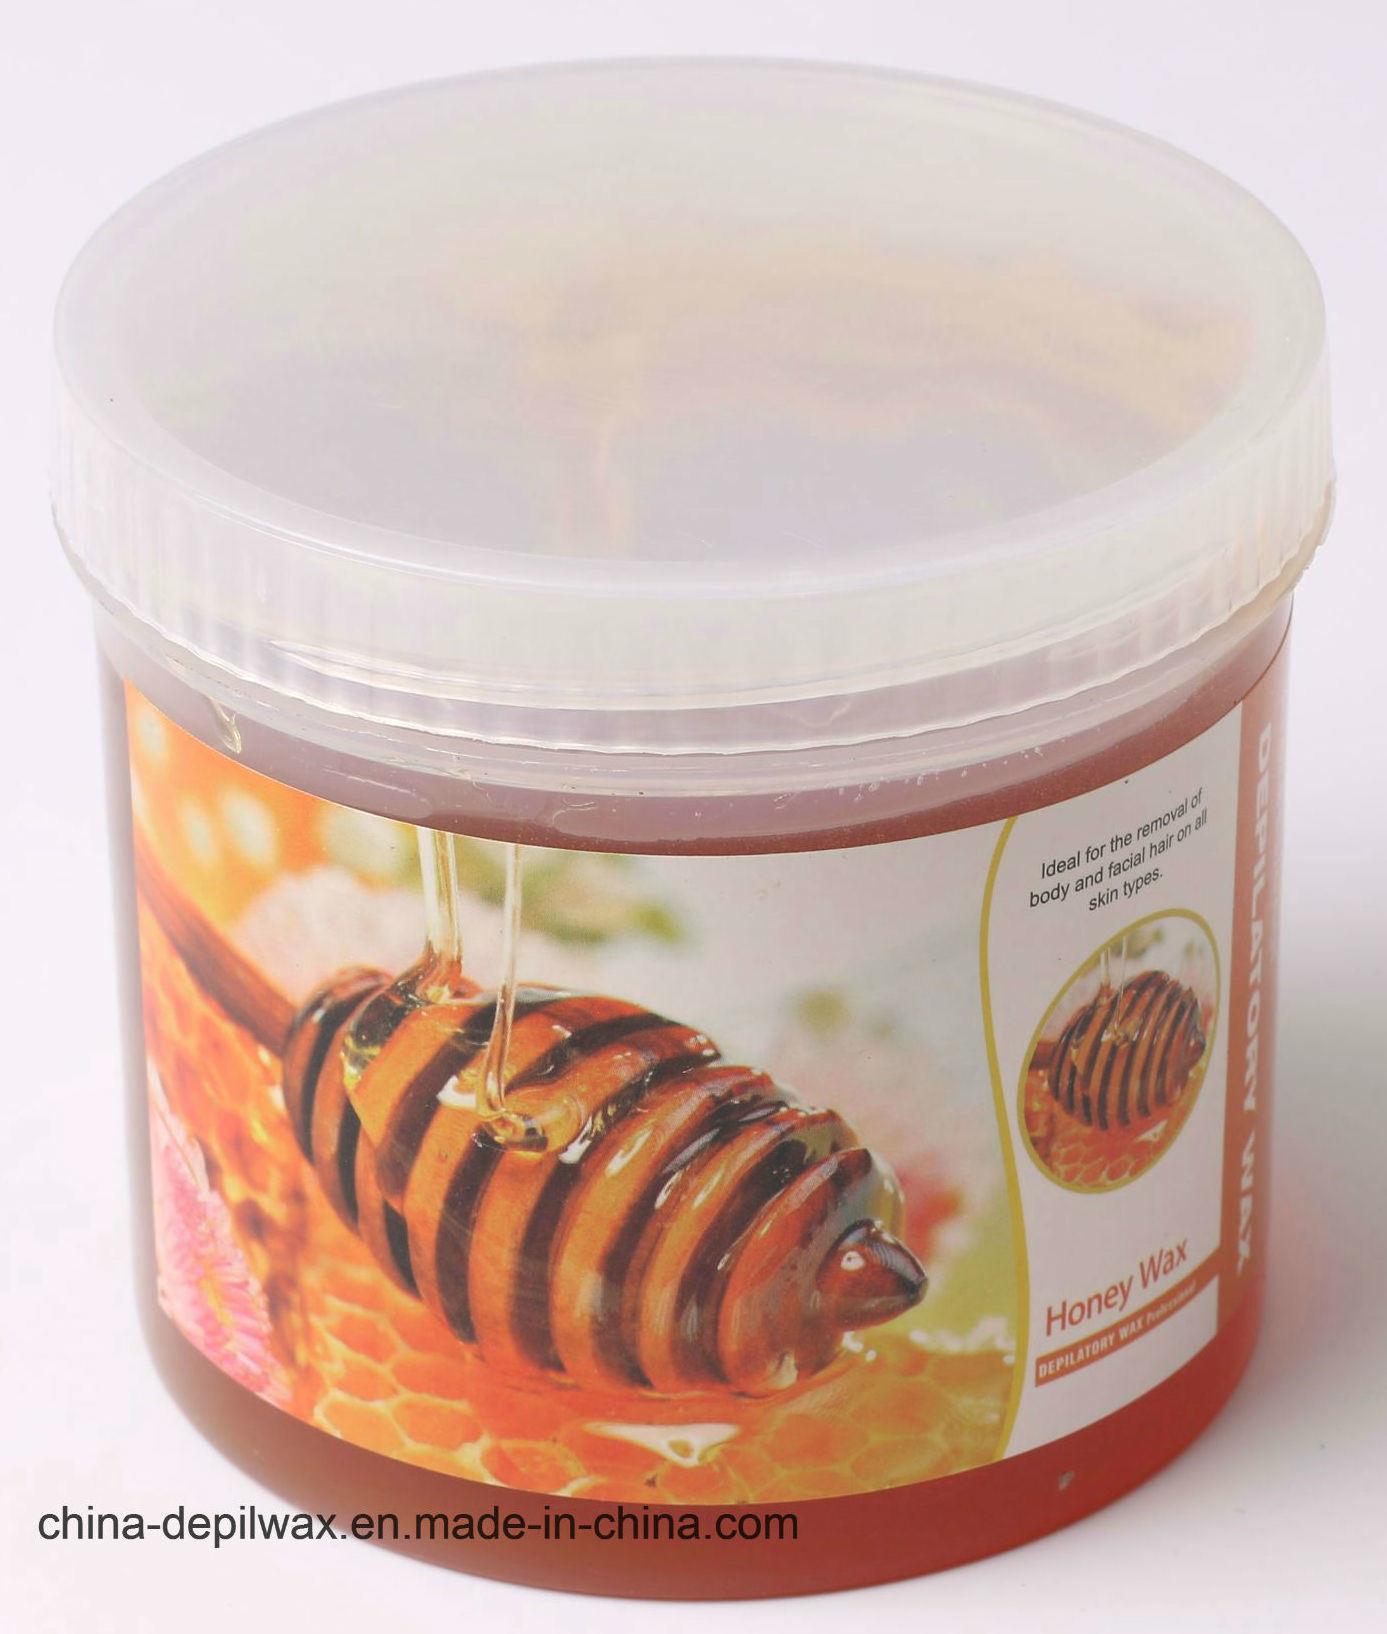 425g Jar Soft Depilatory Wax Pink Creme Wax with Less Pain Waxing